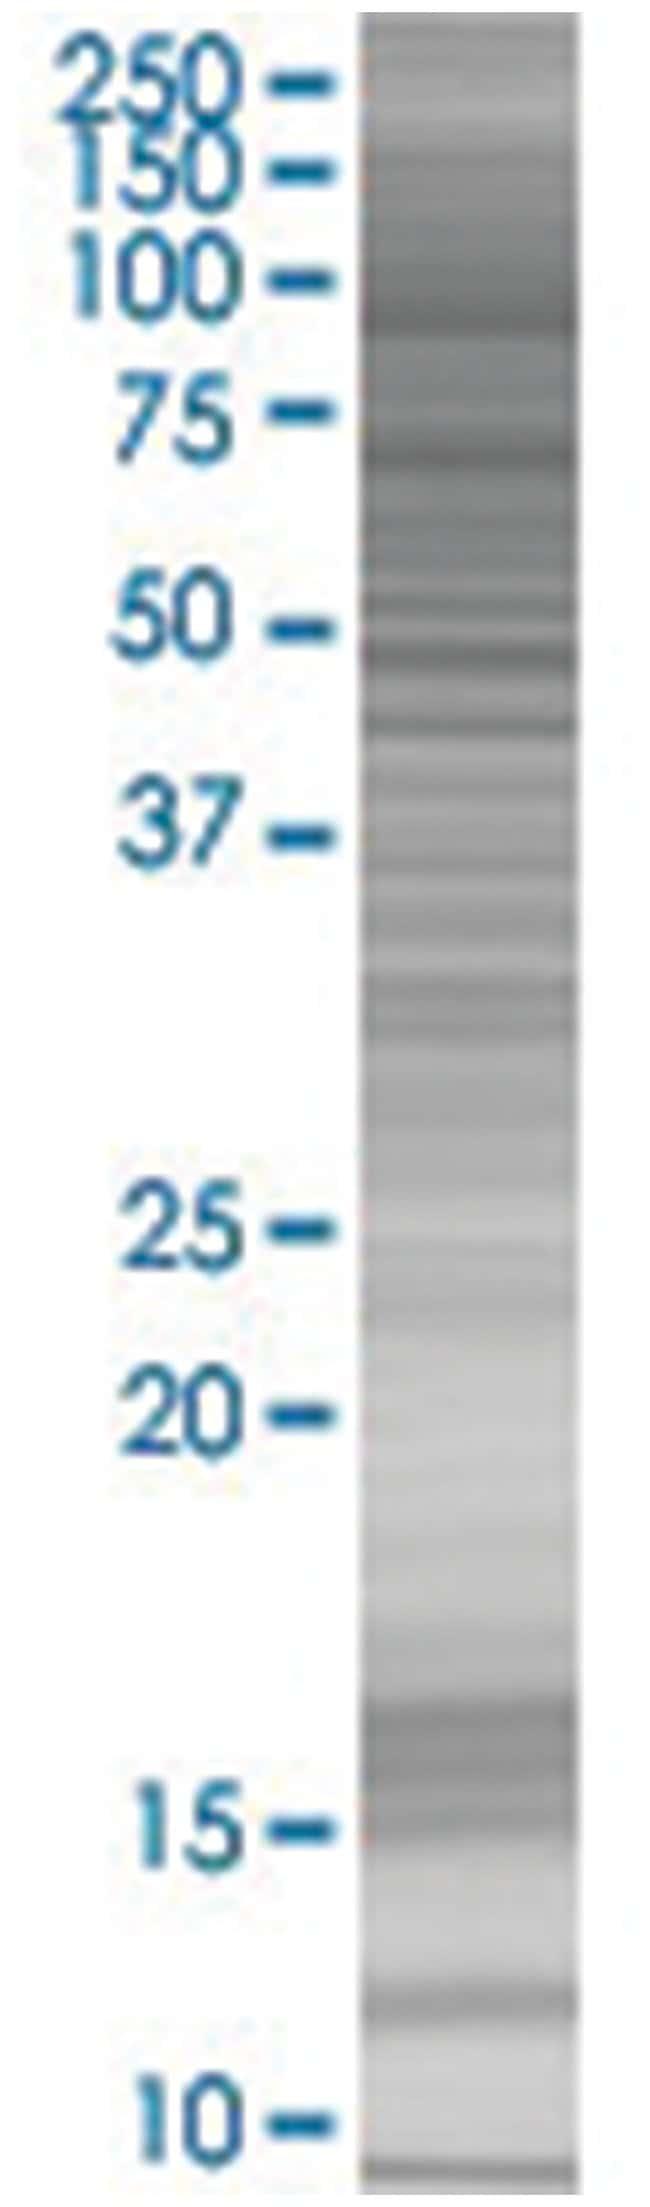 FAP 293T Cell Overexpression Lysate (Denatured), Abnova 100µL:Life